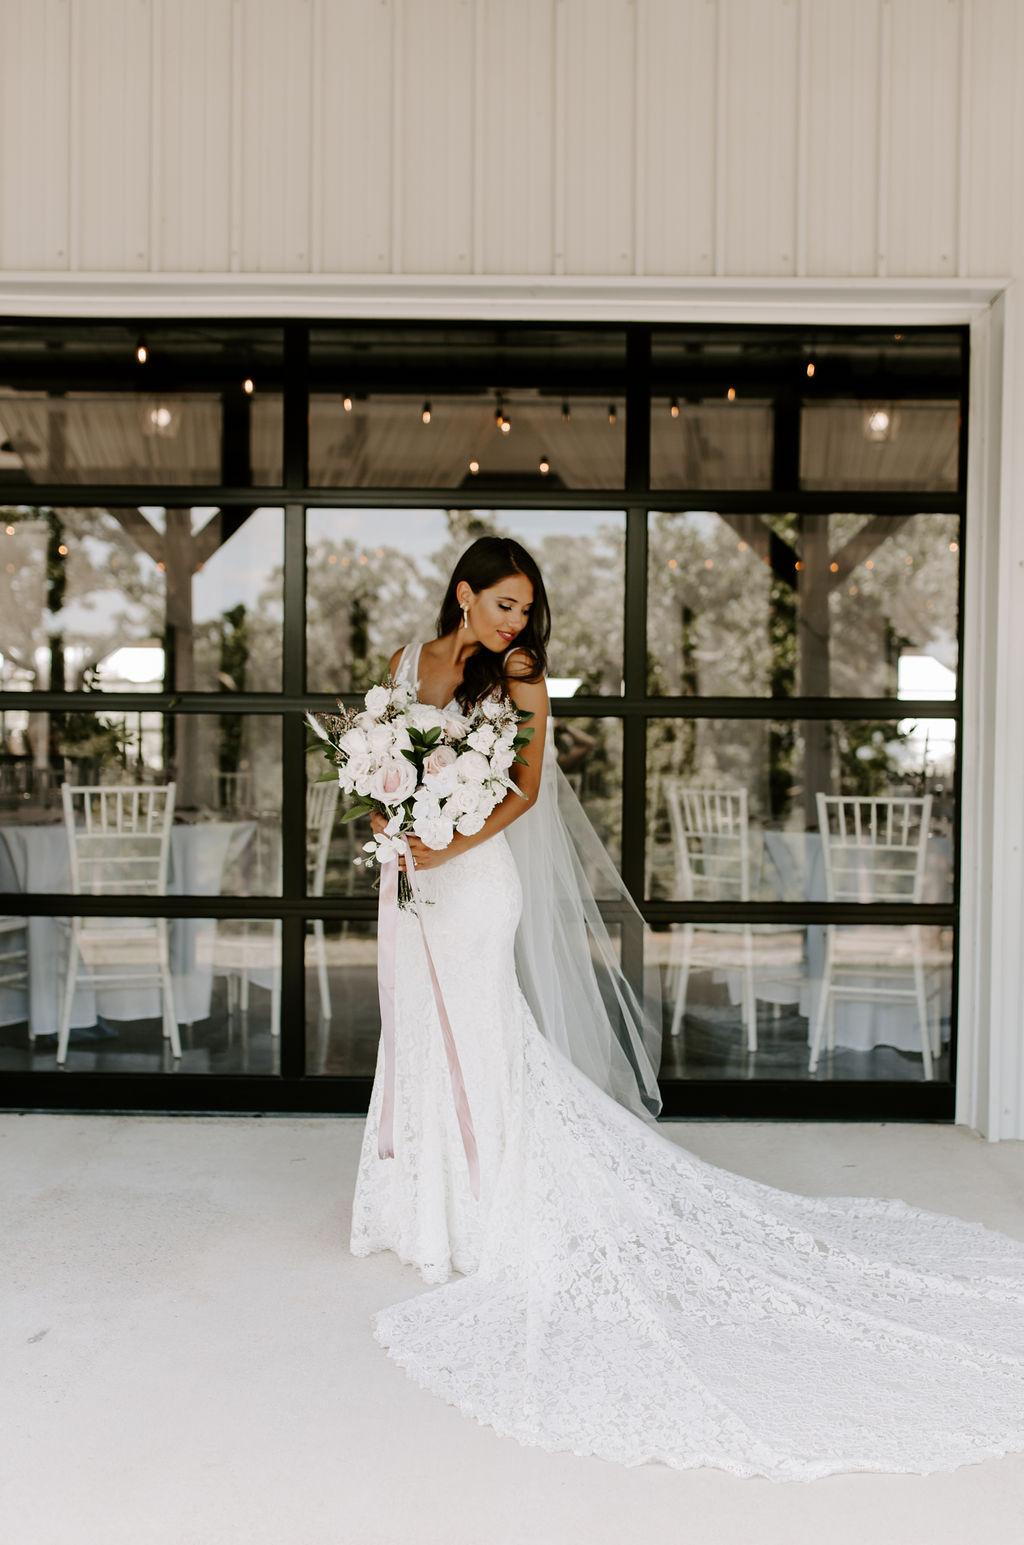 Tulsa White Barn Wedding Venue Outdoor Ceremony 53.jpg